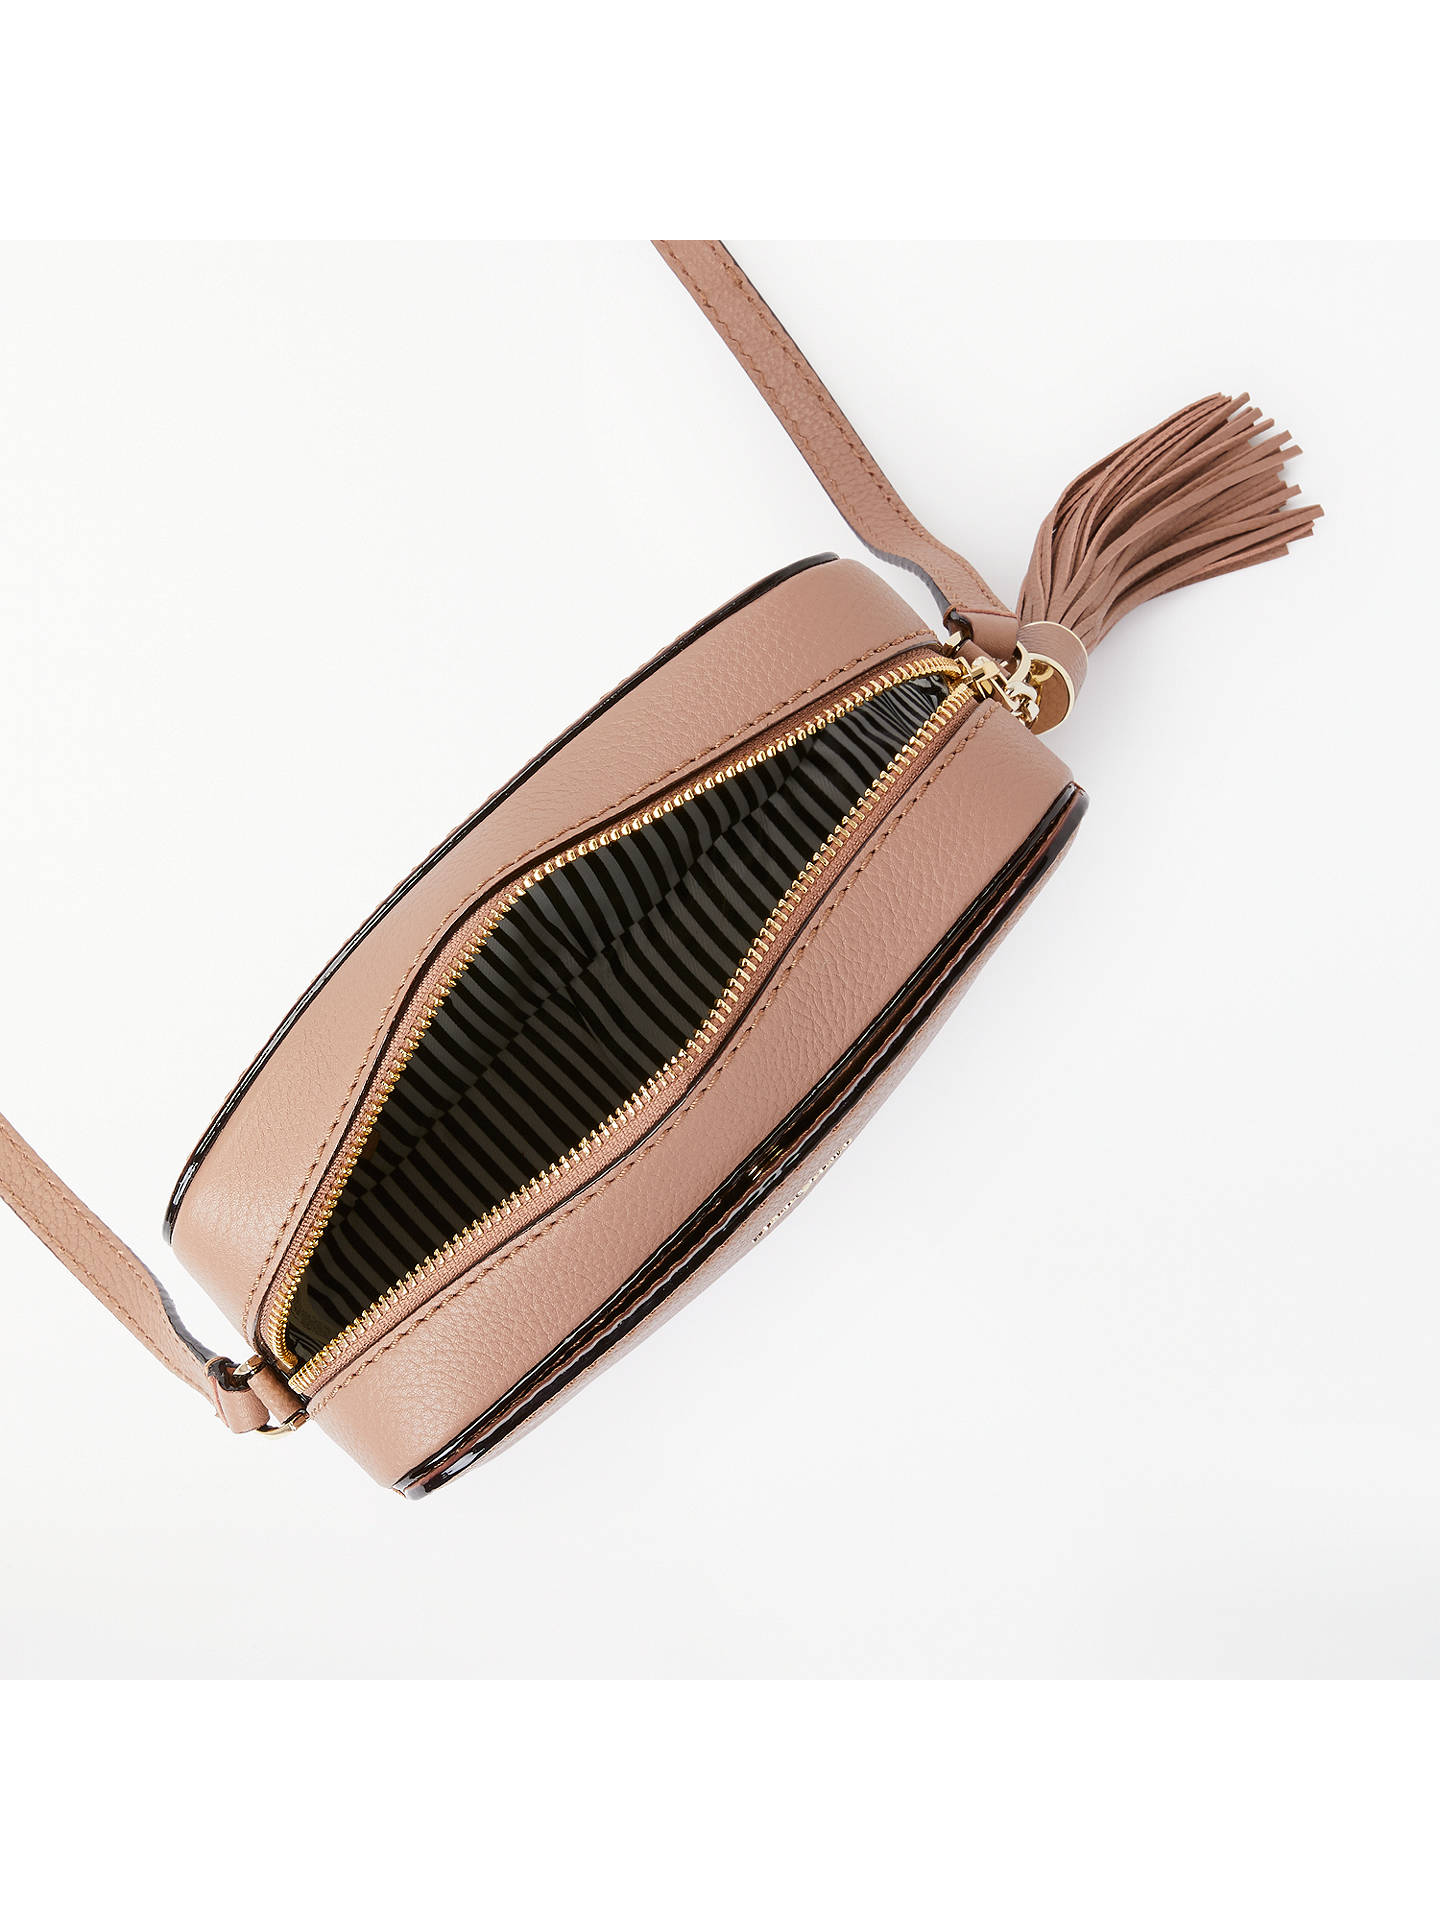 6b0b873cad85 ... Buy kate spade new york Kingston Drive Arla Leather Cross Body Bag